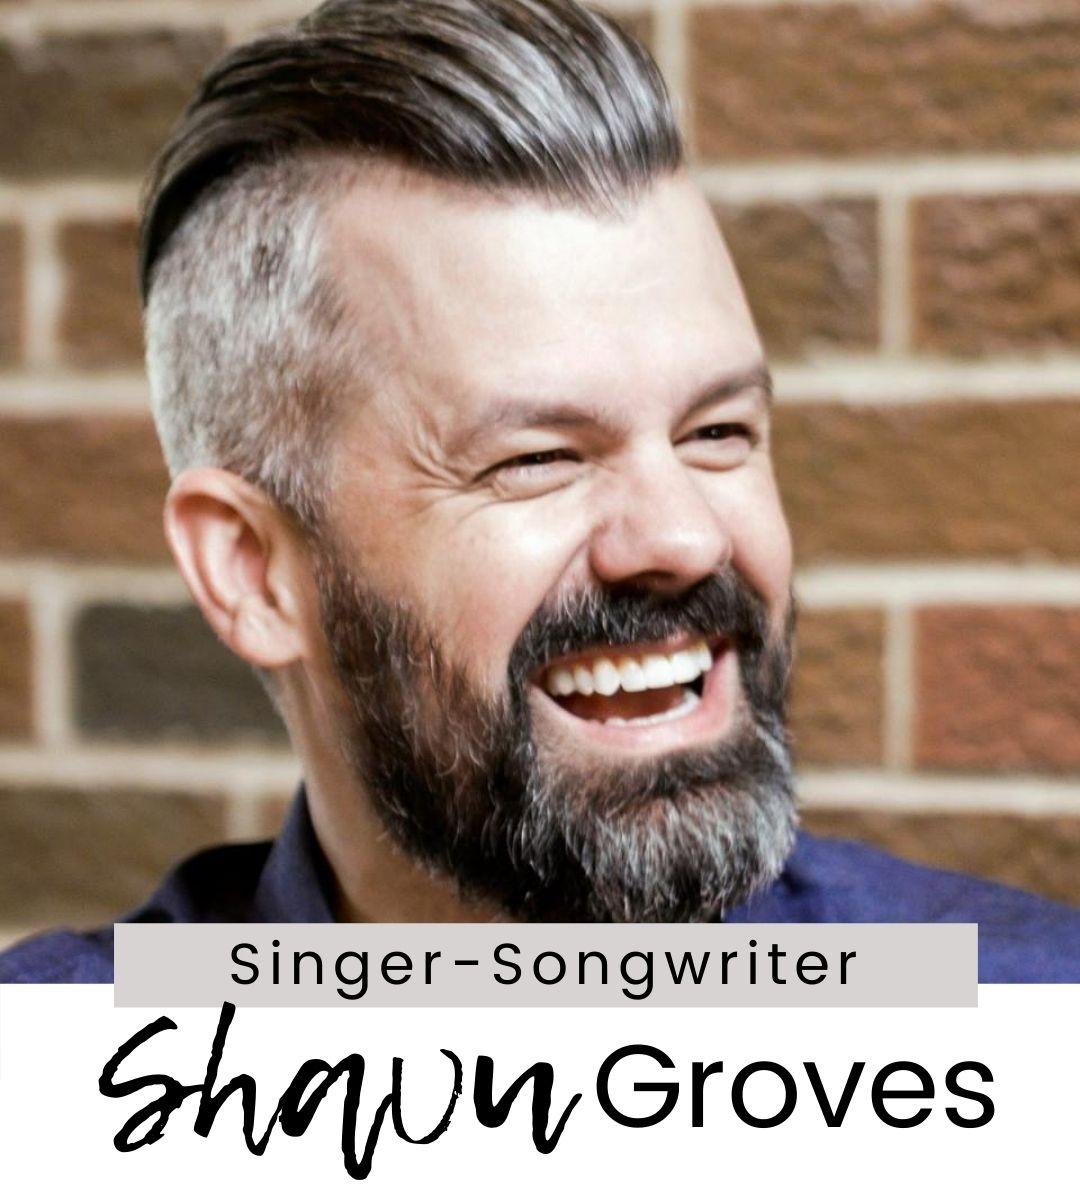 Shaun_Groves